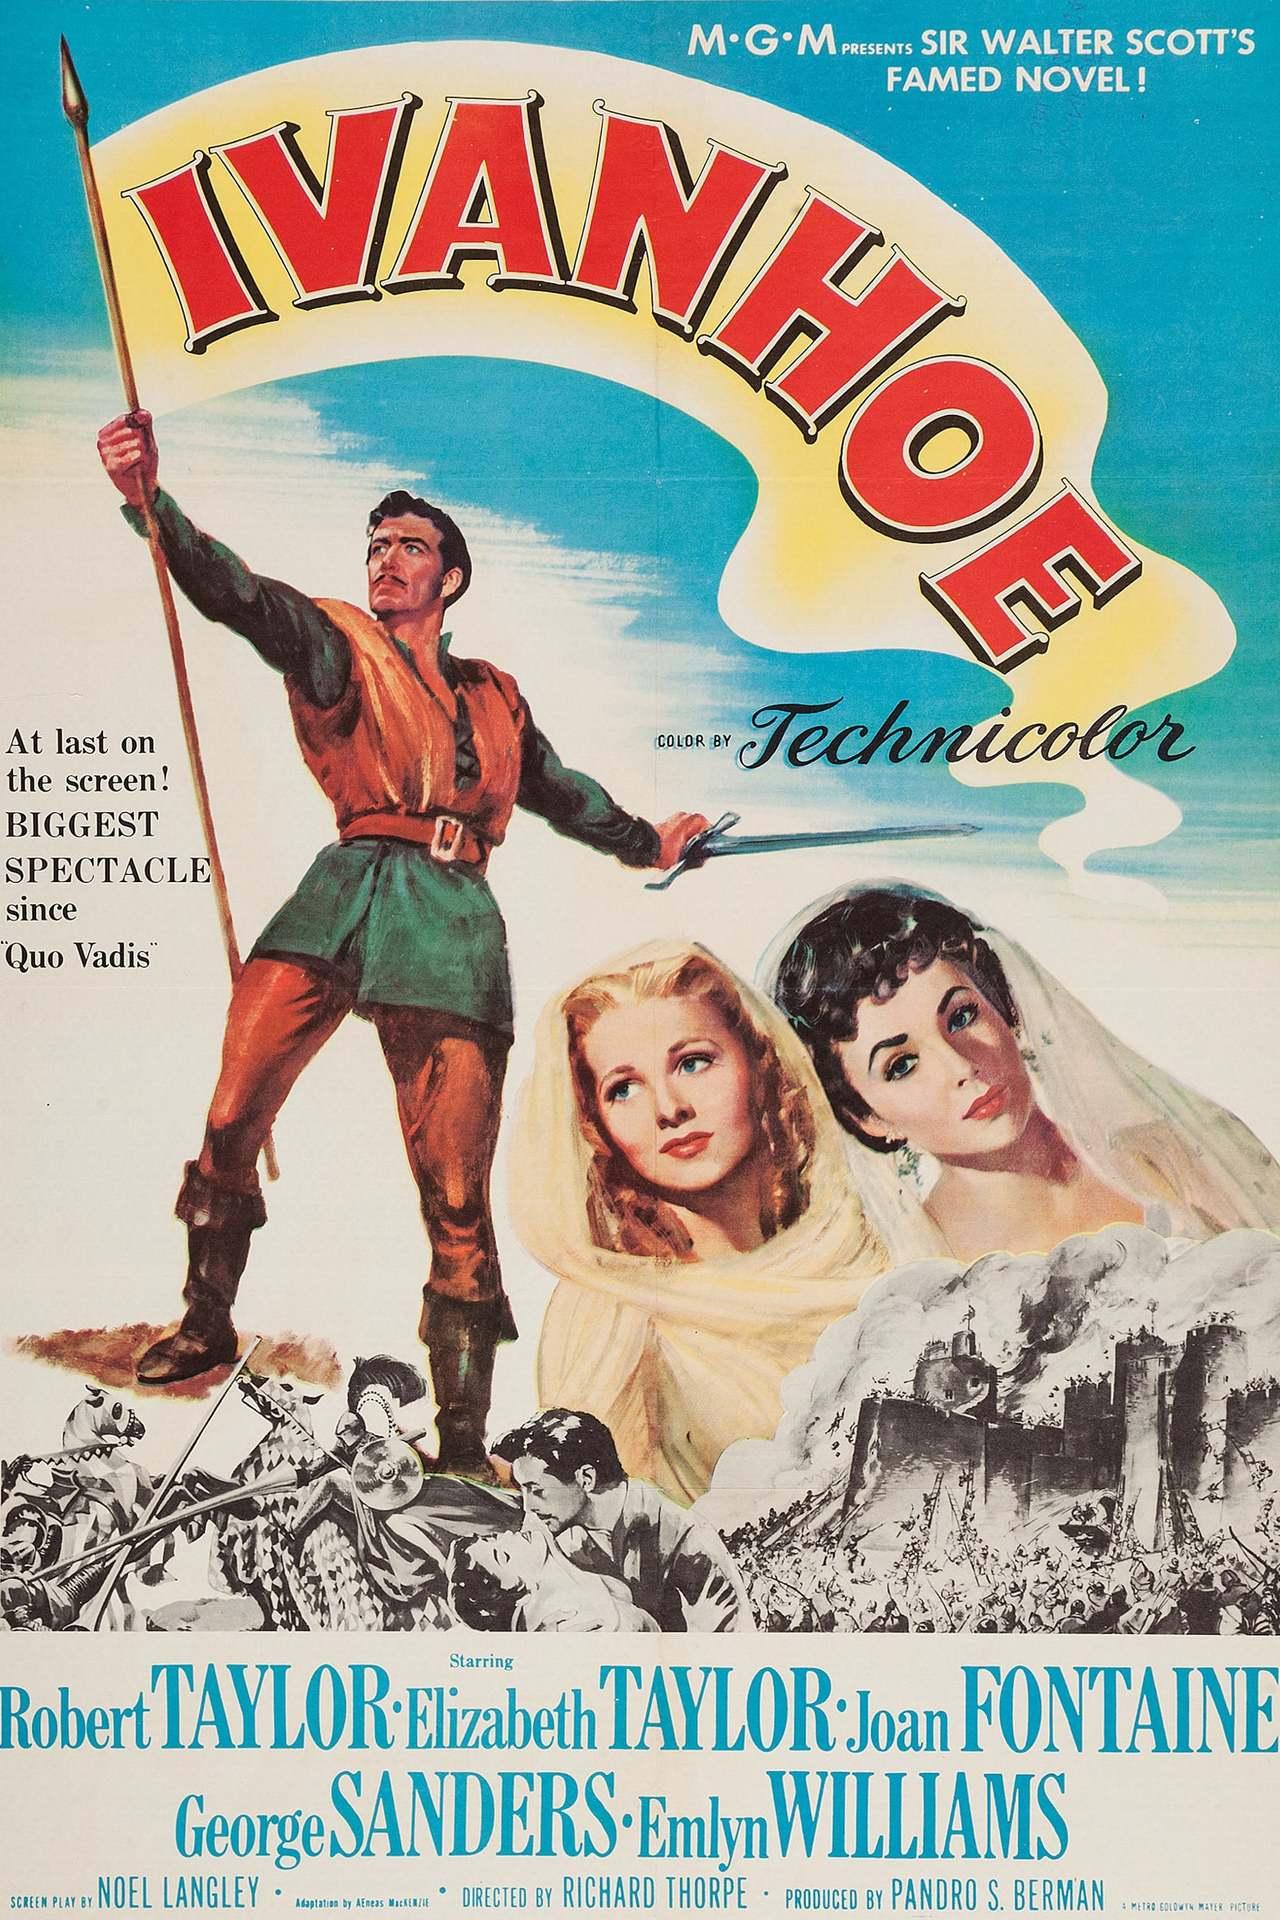 Постер фильма Айвенго Ivanhoe 1952